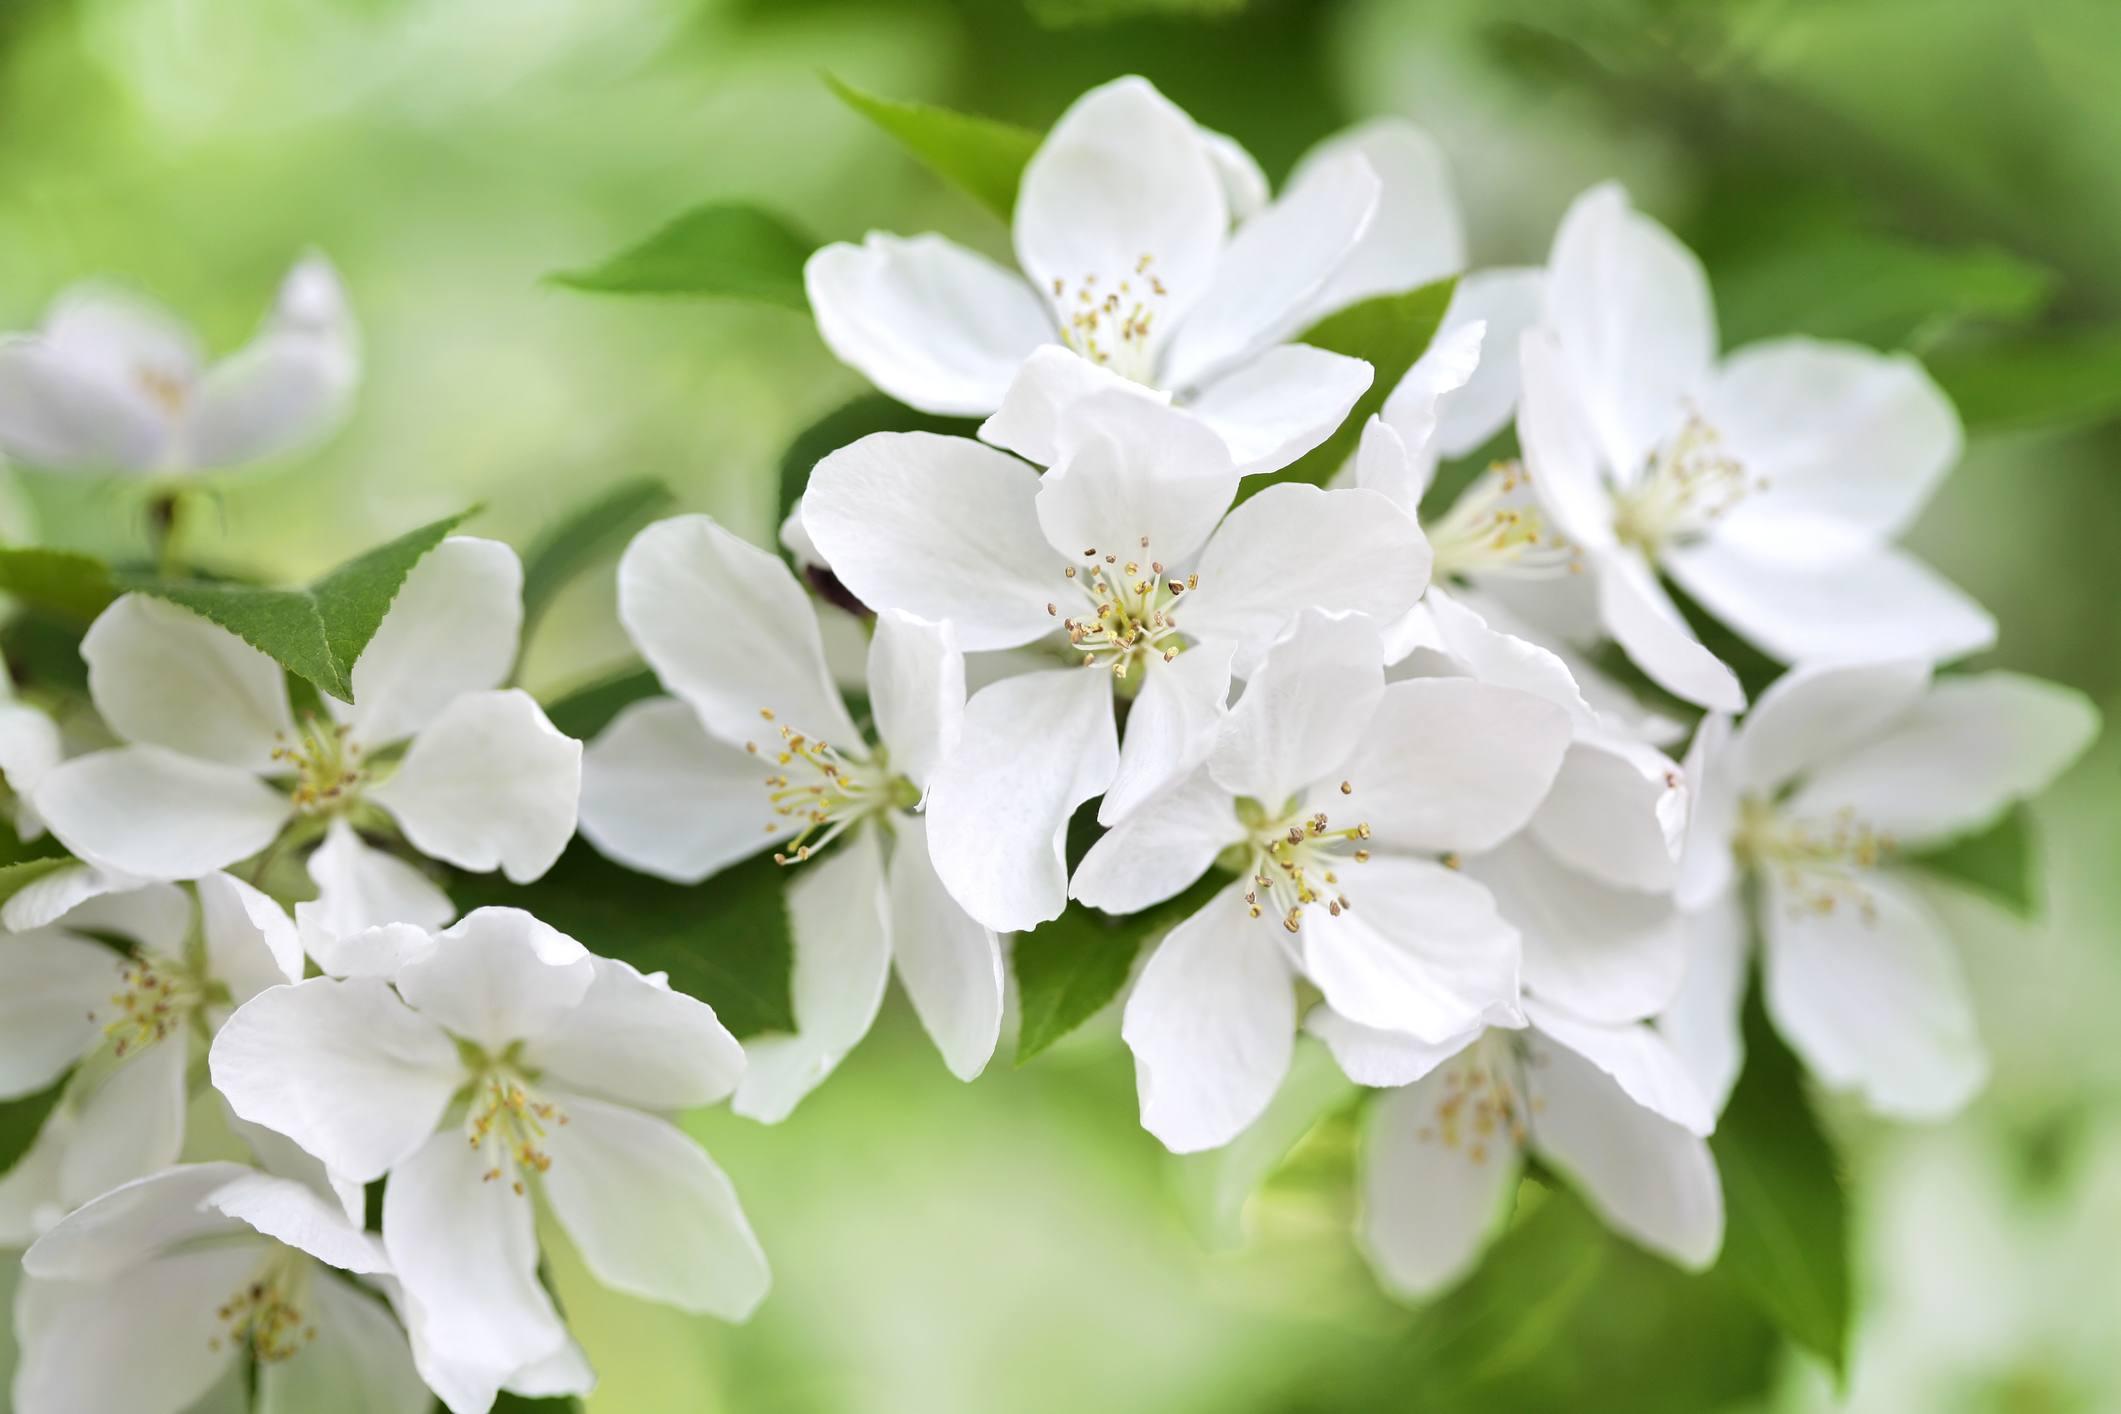 White crabapple flowers in bloom.